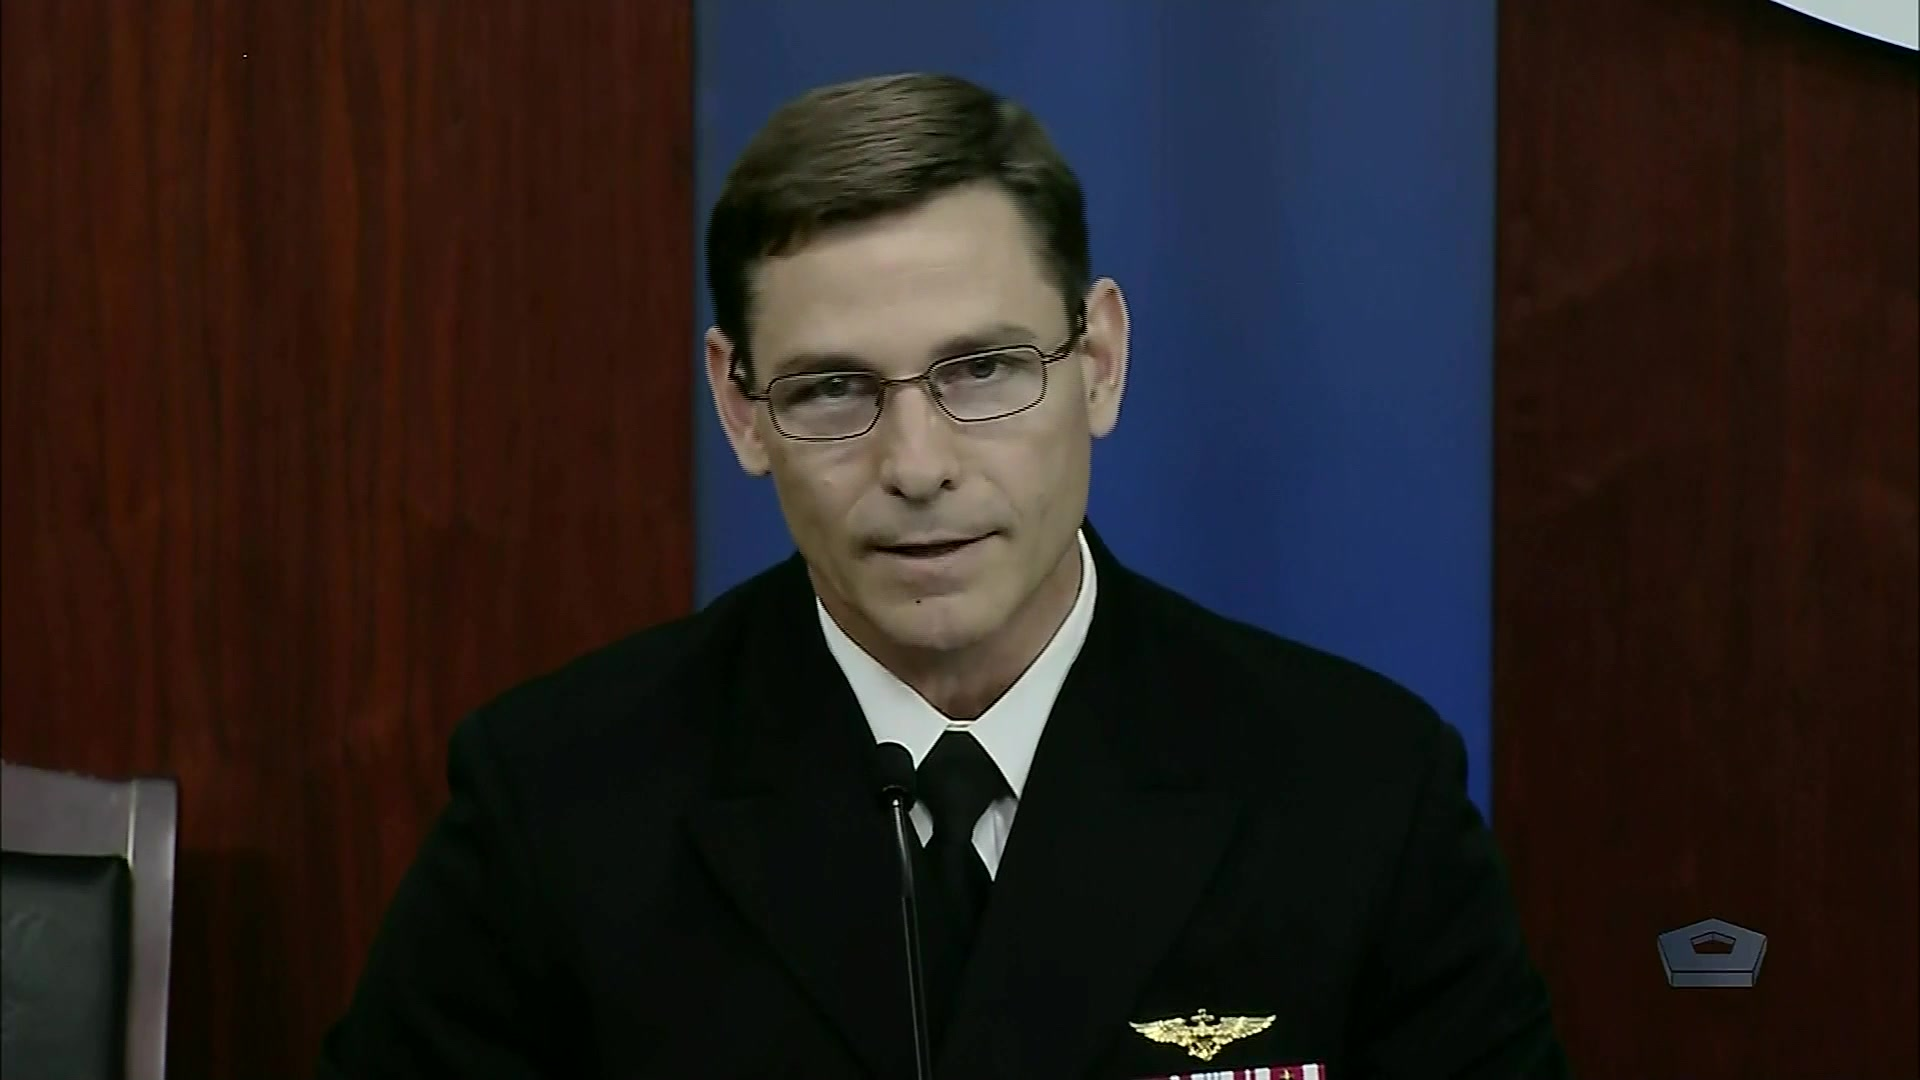 Navy Rear Adm. John Gumbleton, deputy assistant secretary of the Navy for budget briefs the news media on President Joe Biden's fiscal 2022 defense budget, May 28, 2021.